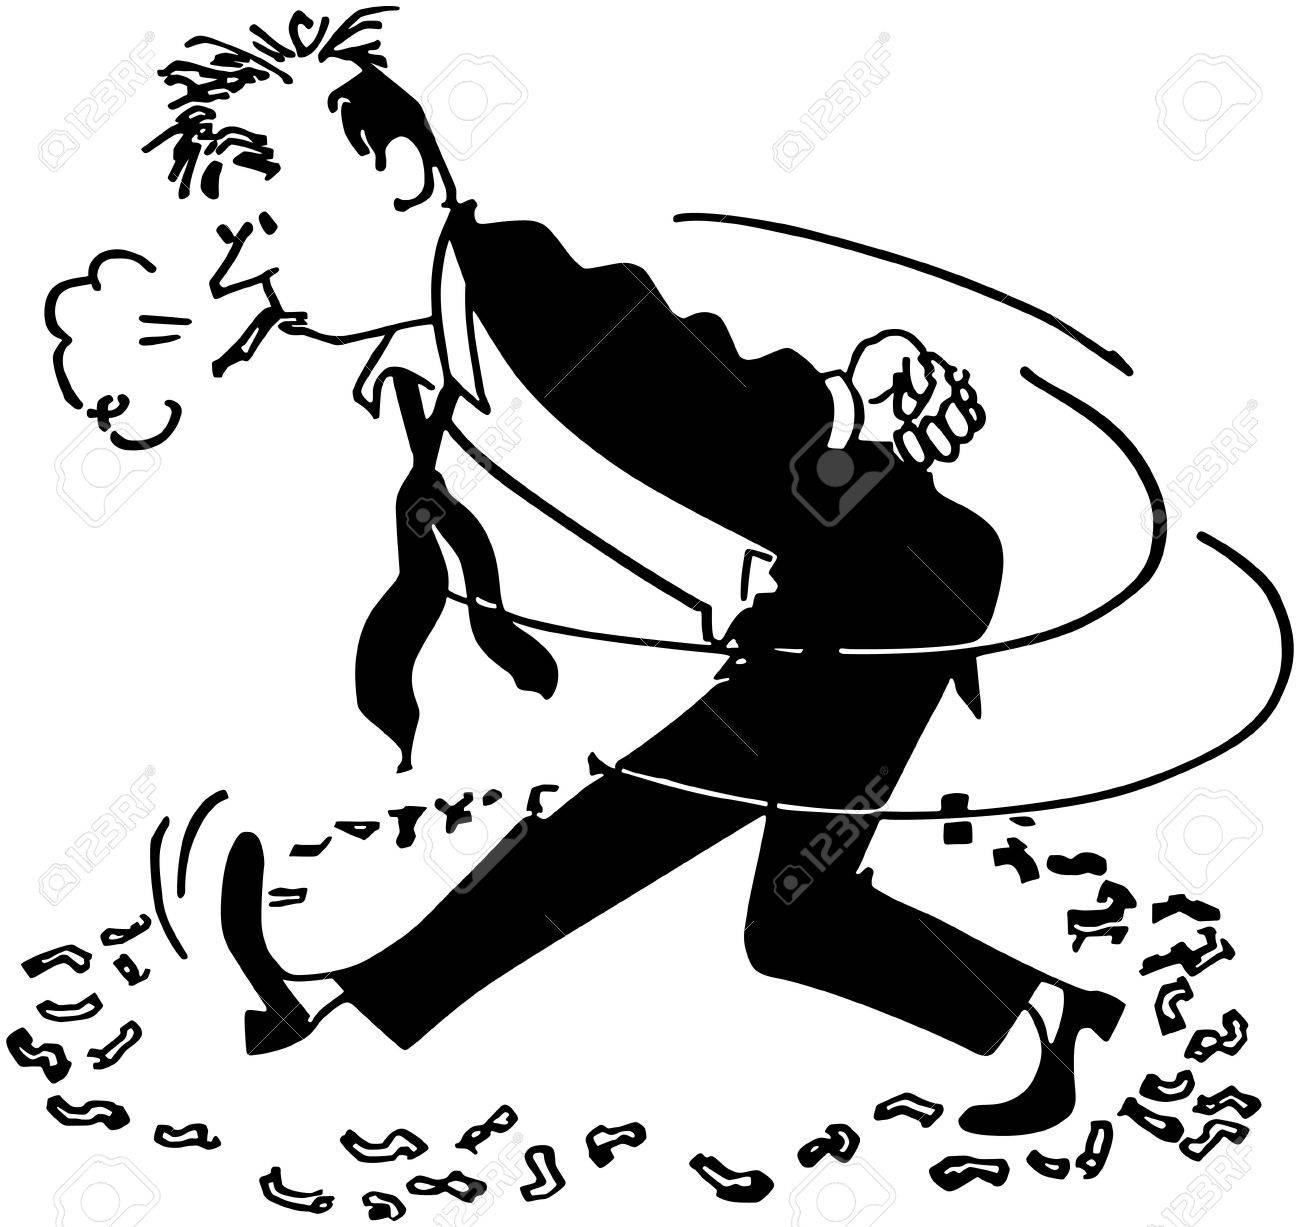 pacing smoker royalty free cliparts vectors and stock illustration